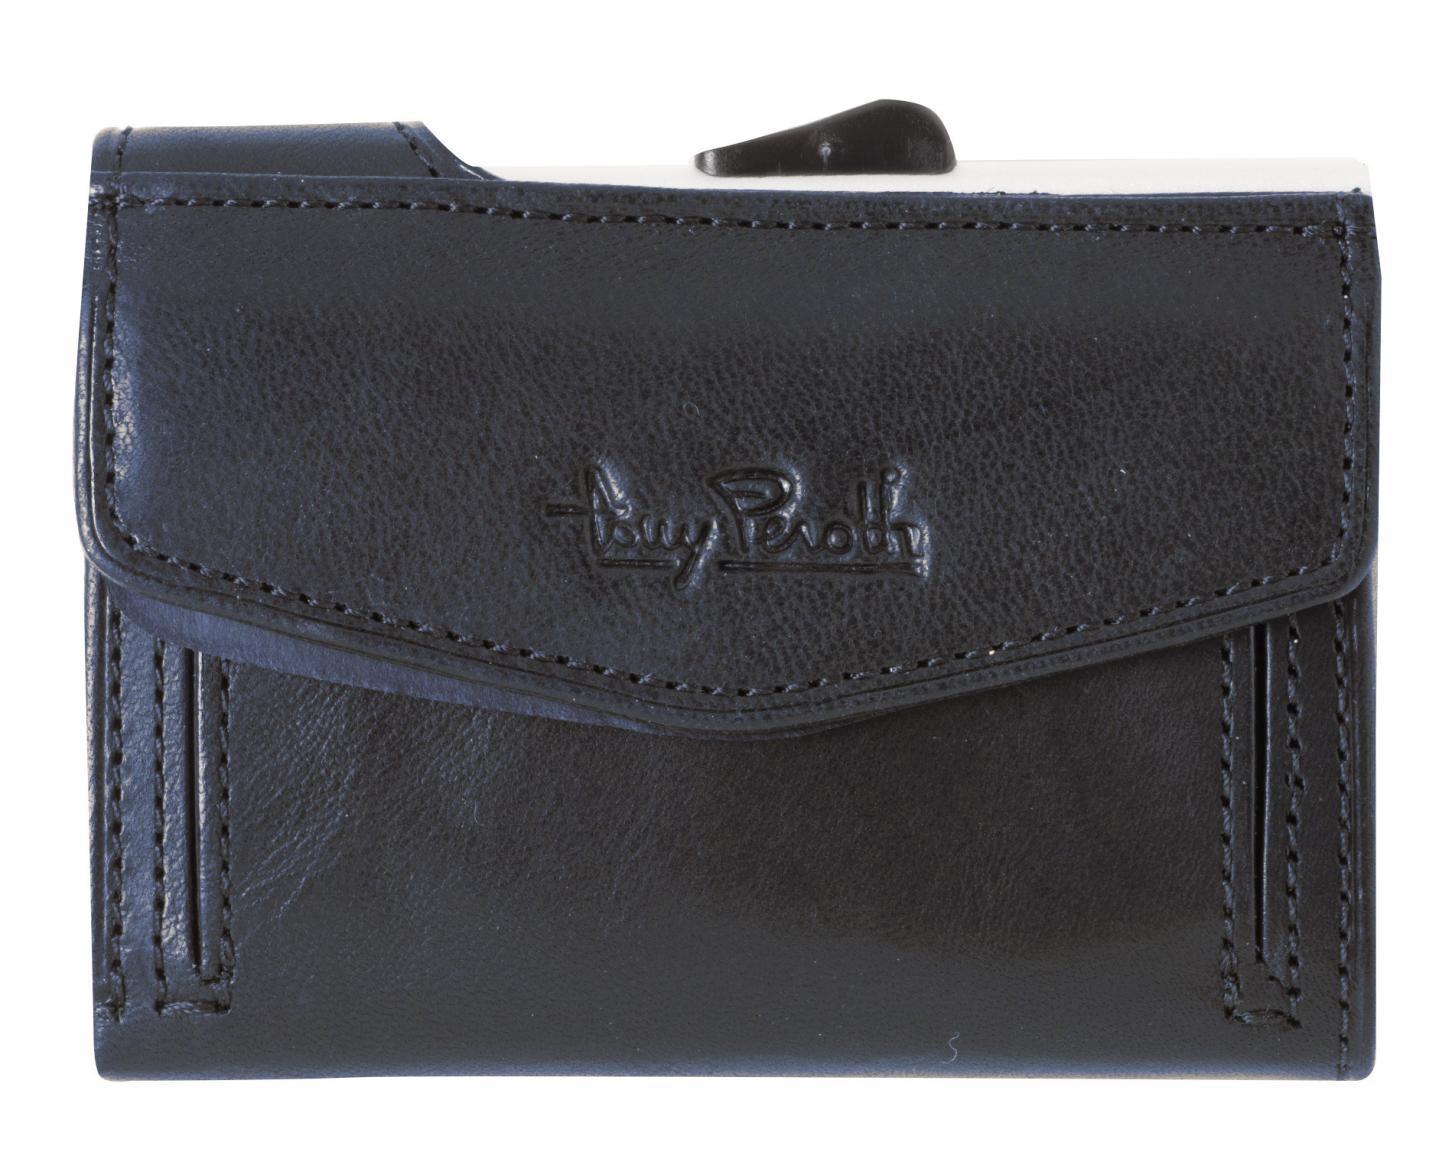 Kartenhülle RFID-Schutz Furbo Navy Blue dunkelblau Tony Perotti